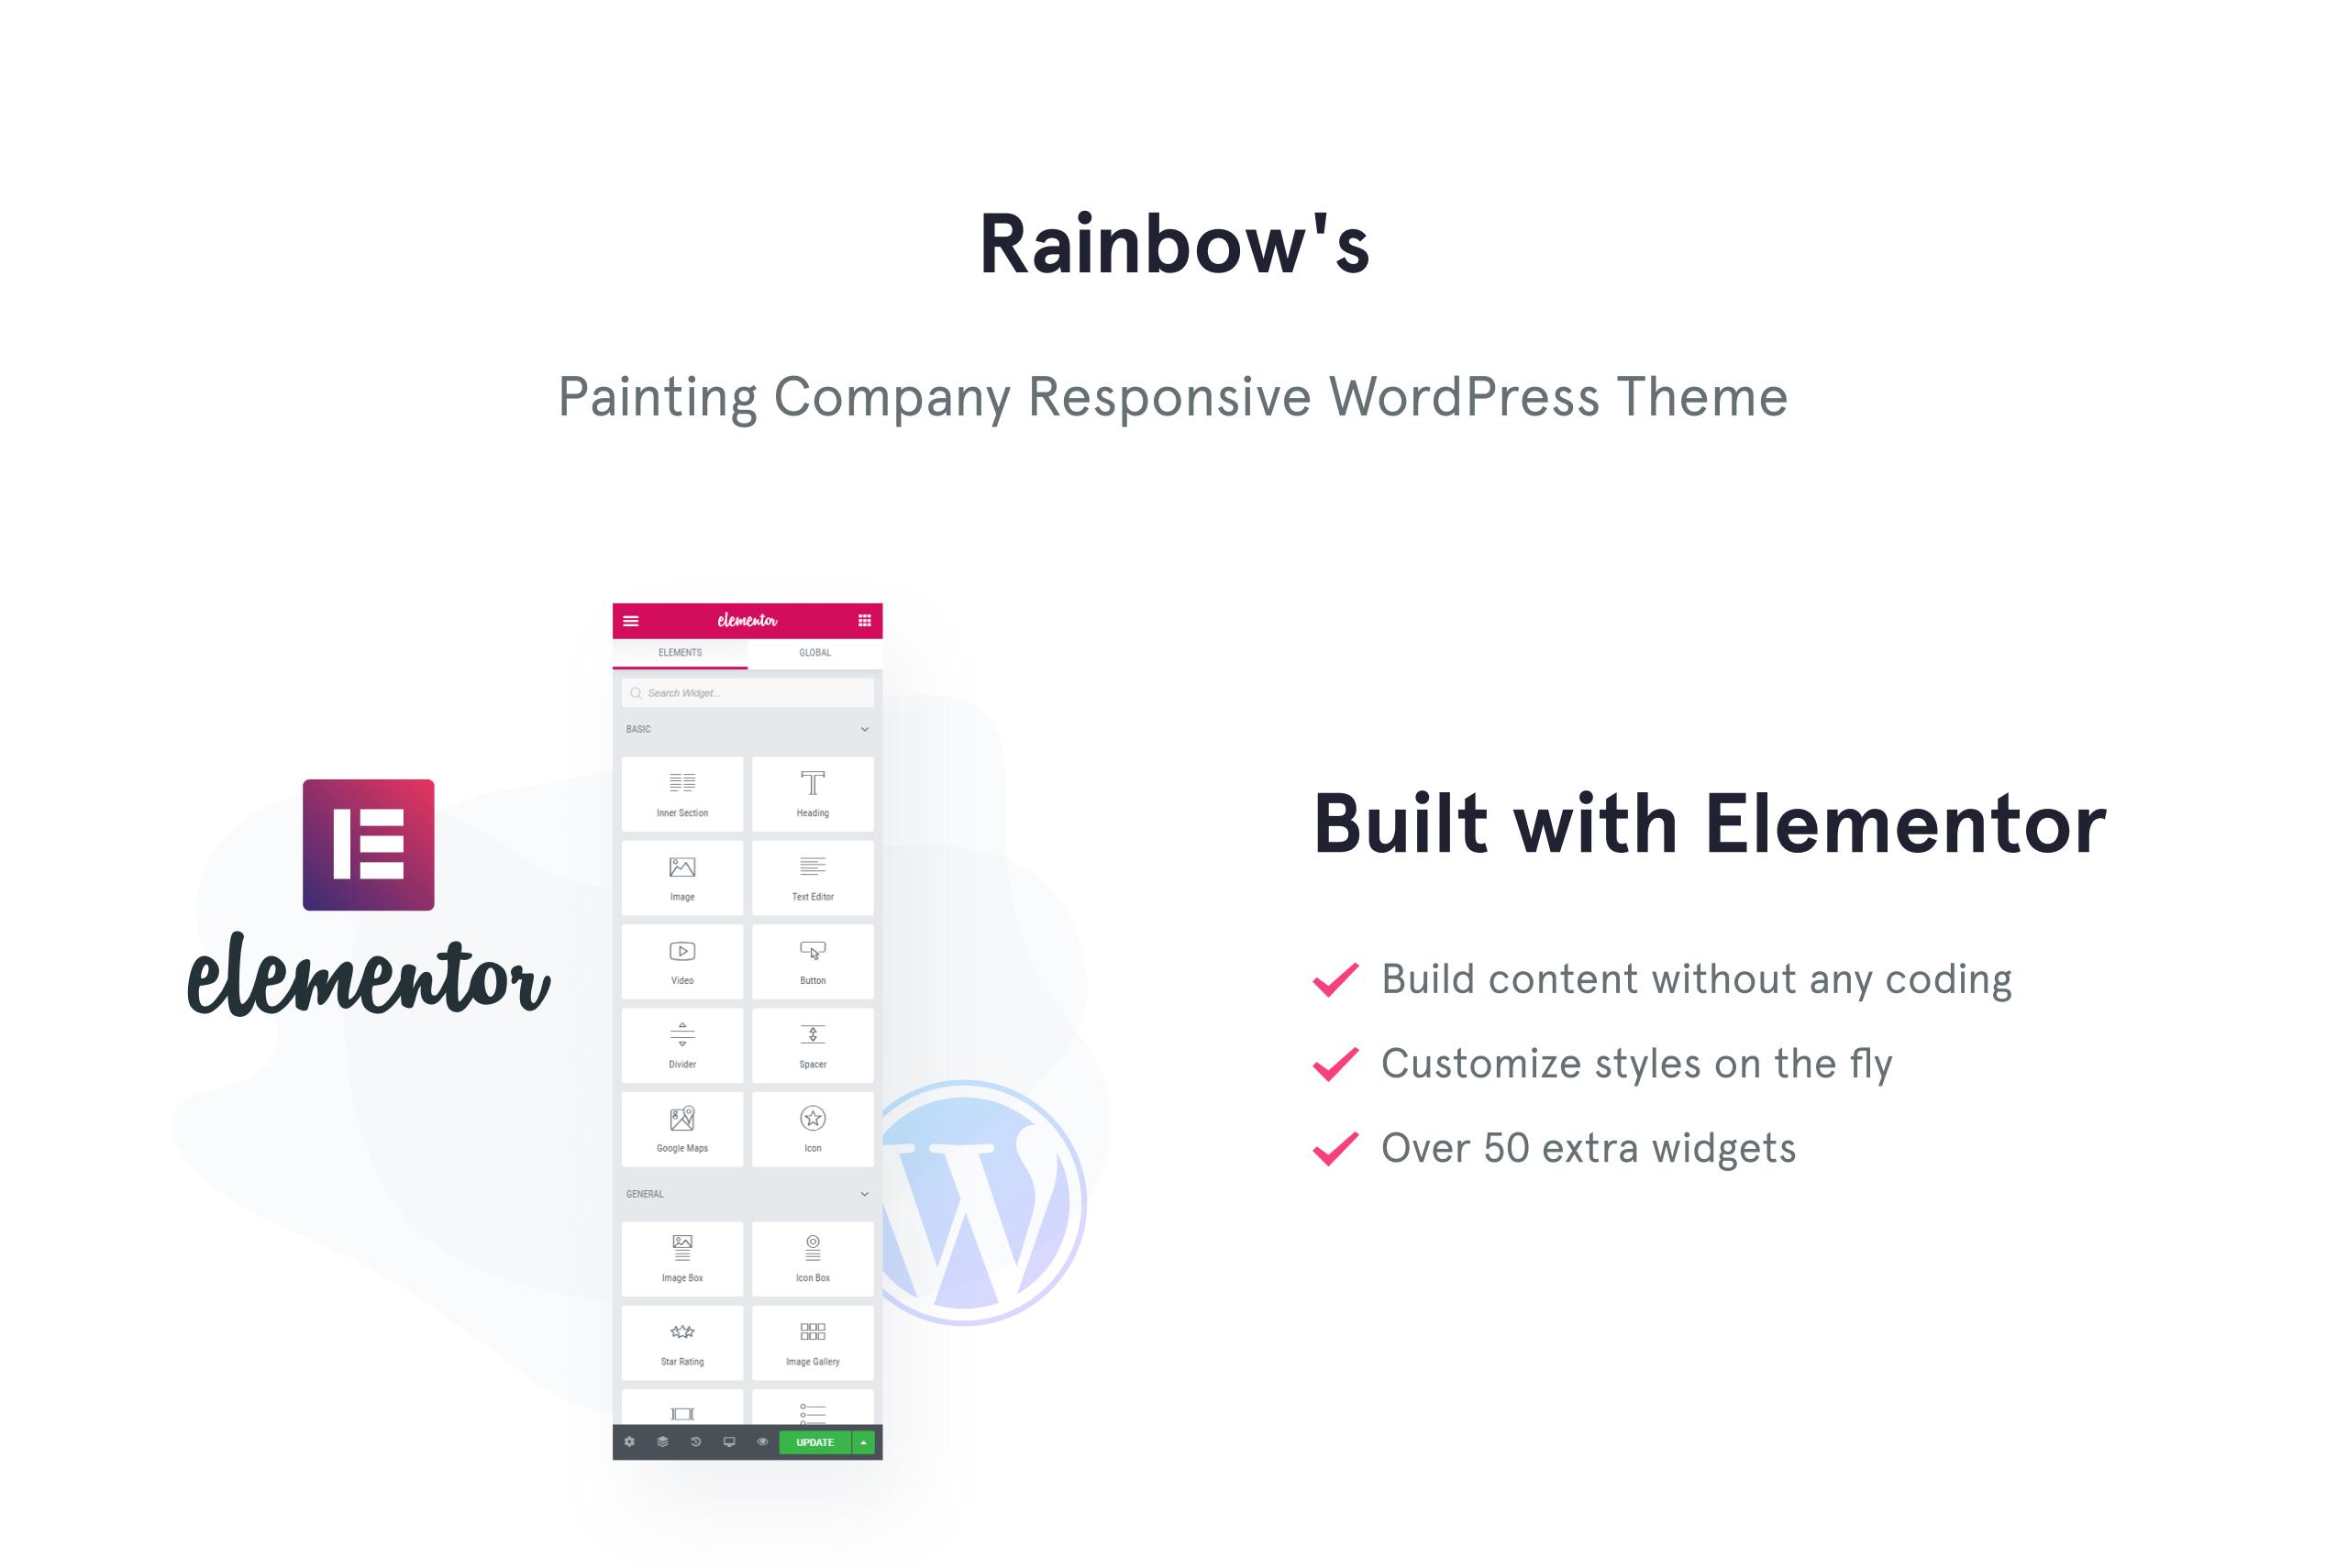 Rainbow's Colors - Painting Company Responsive WordPress Theme